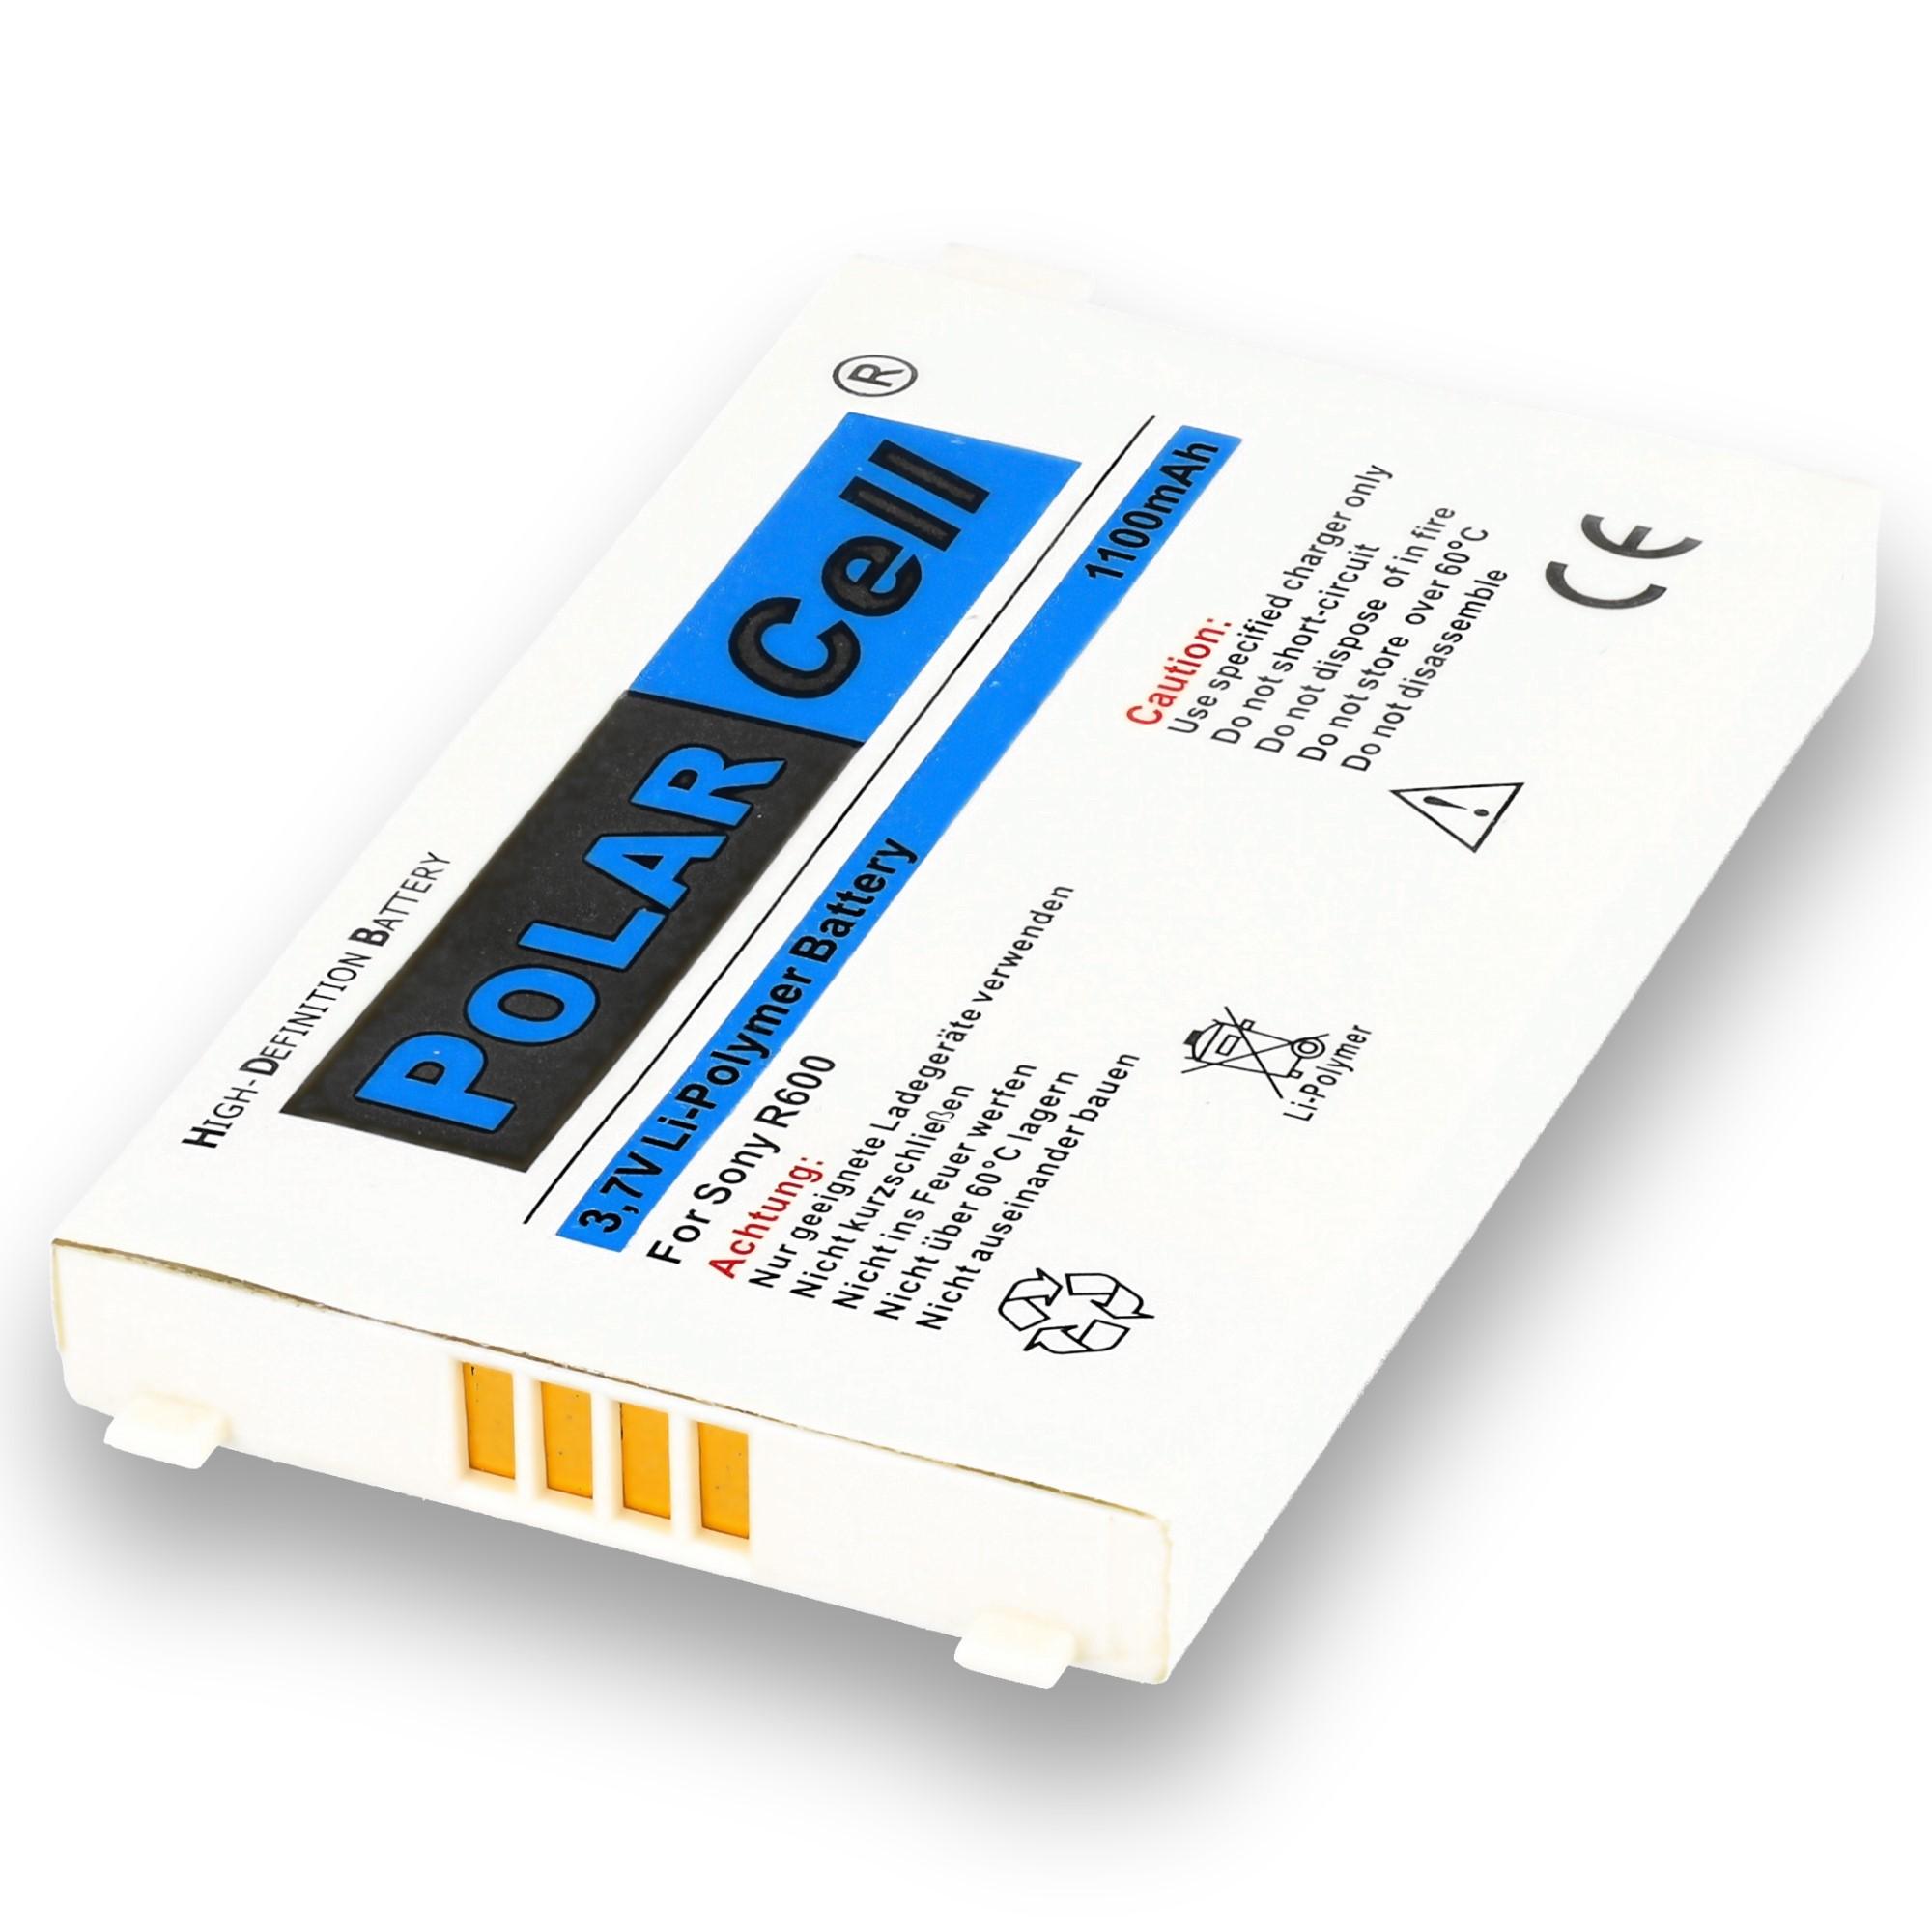 PolarCell-Batterie-pour-Sony-Ericsson-R600-BST-20-1100mAh-Li-Polymer miniature 3